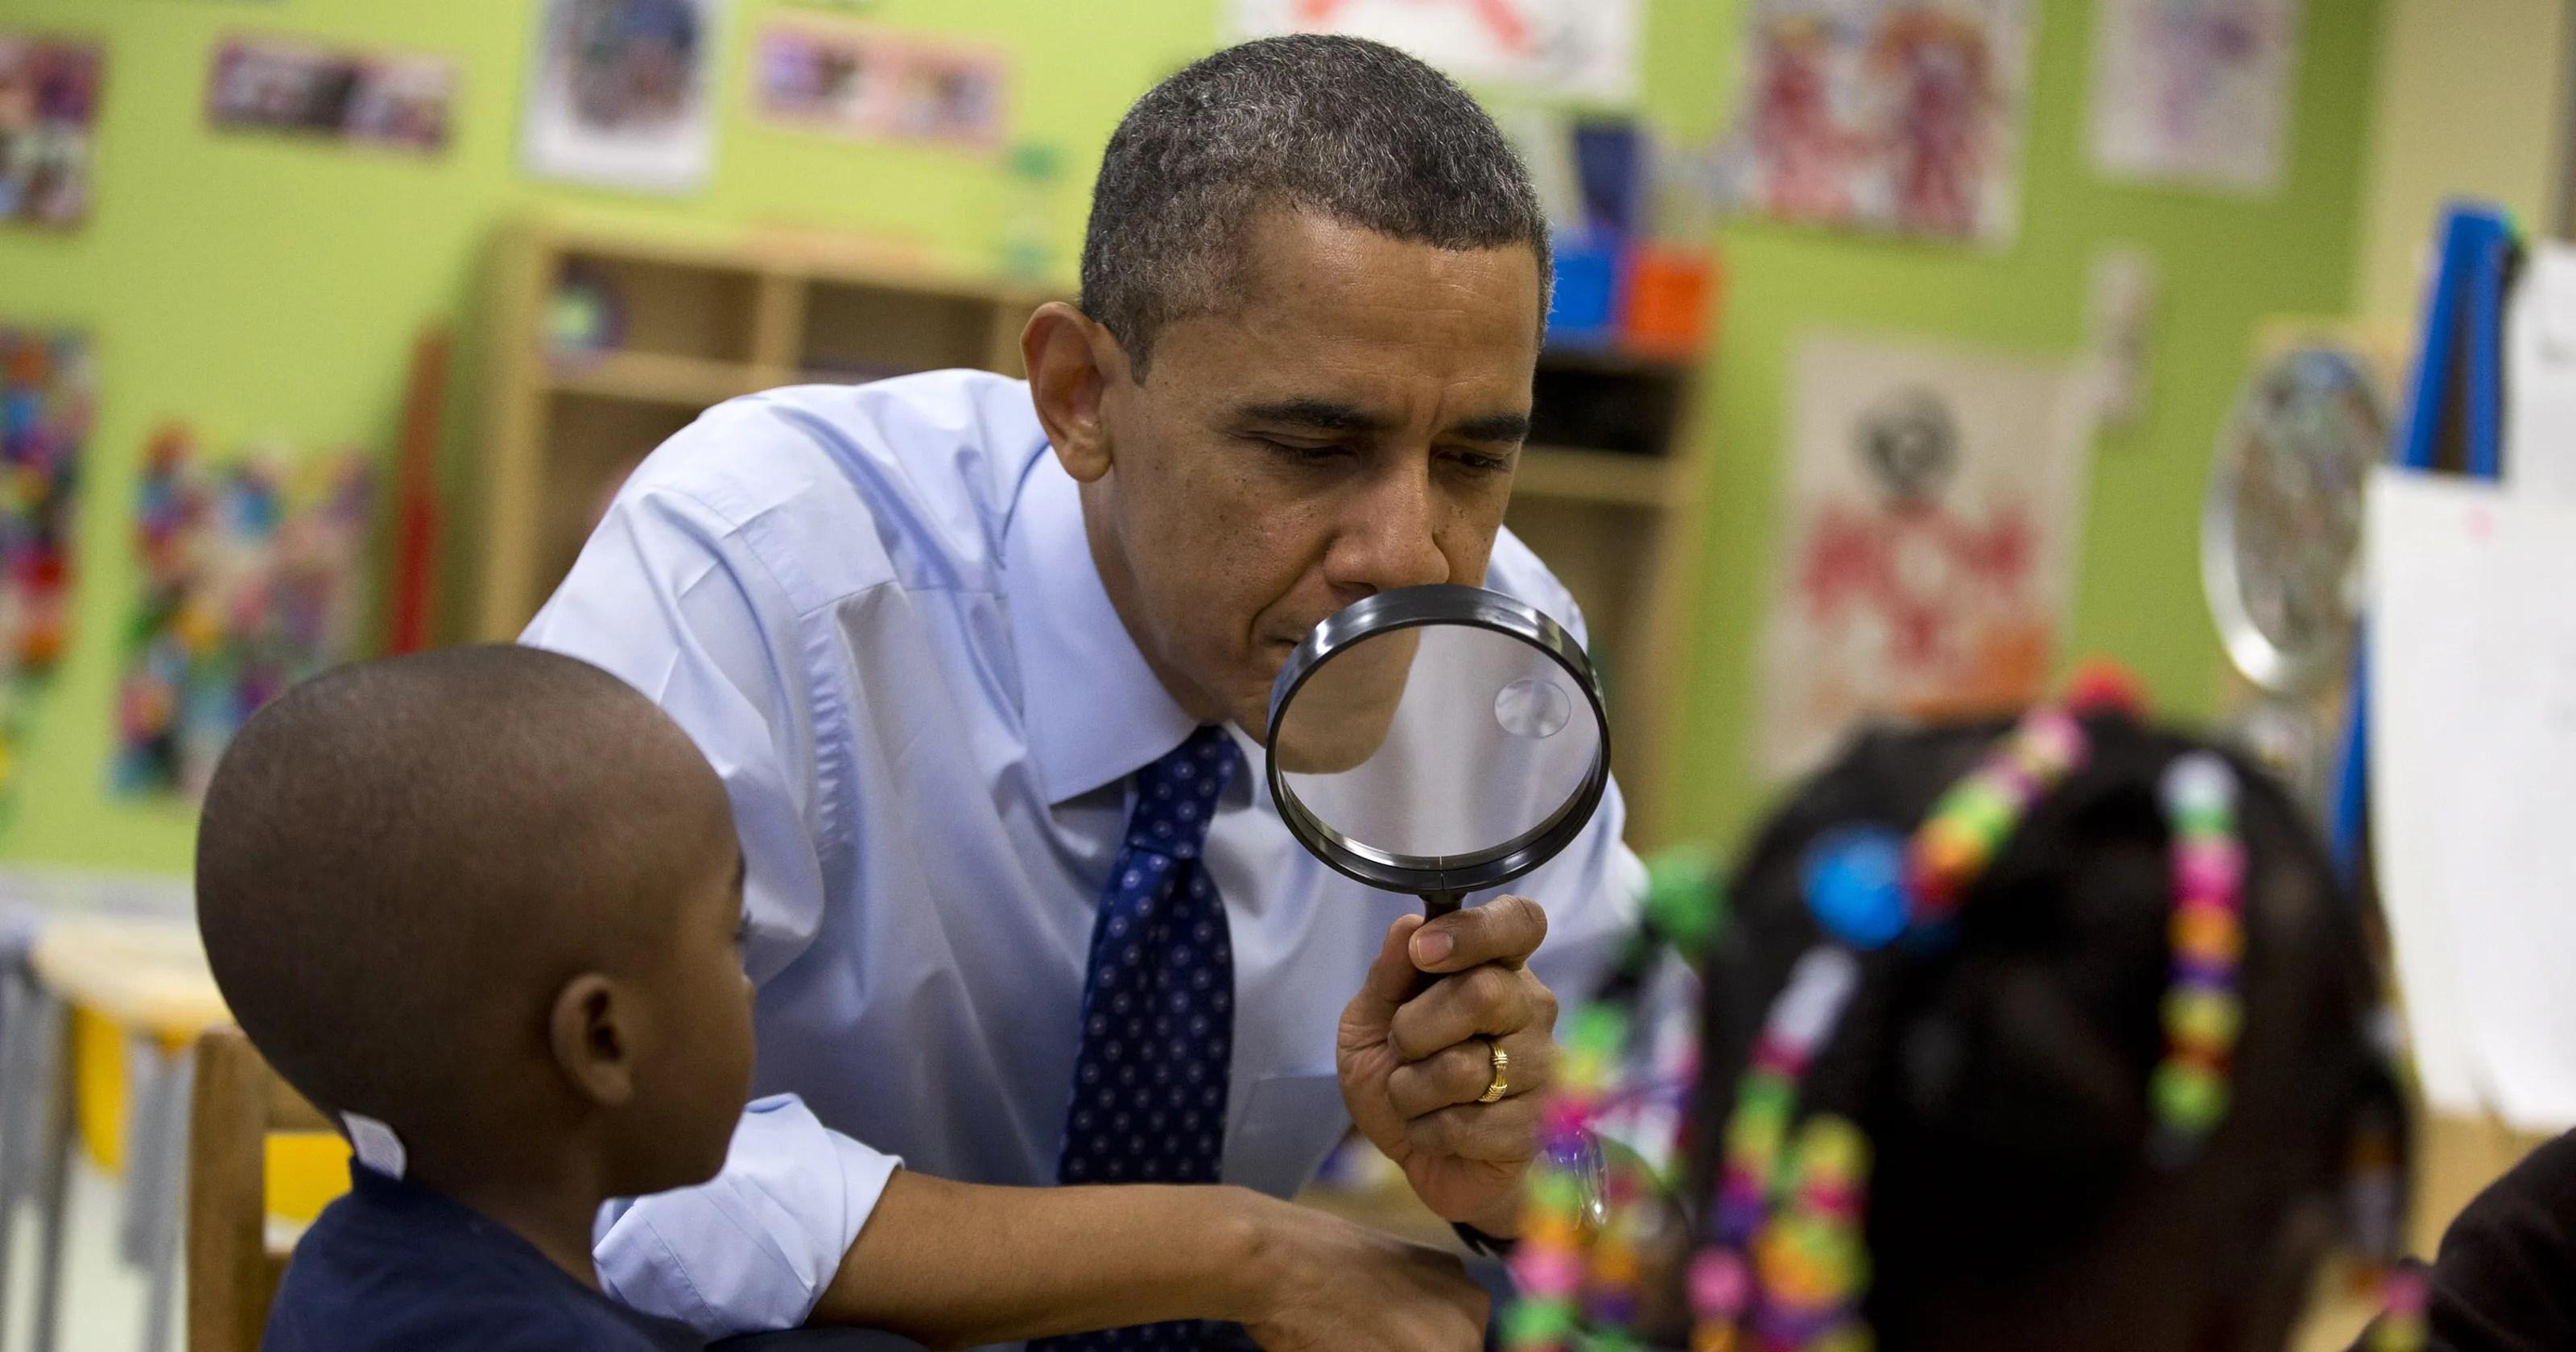 Obama Promotes Preschool Education In Georgia Visit